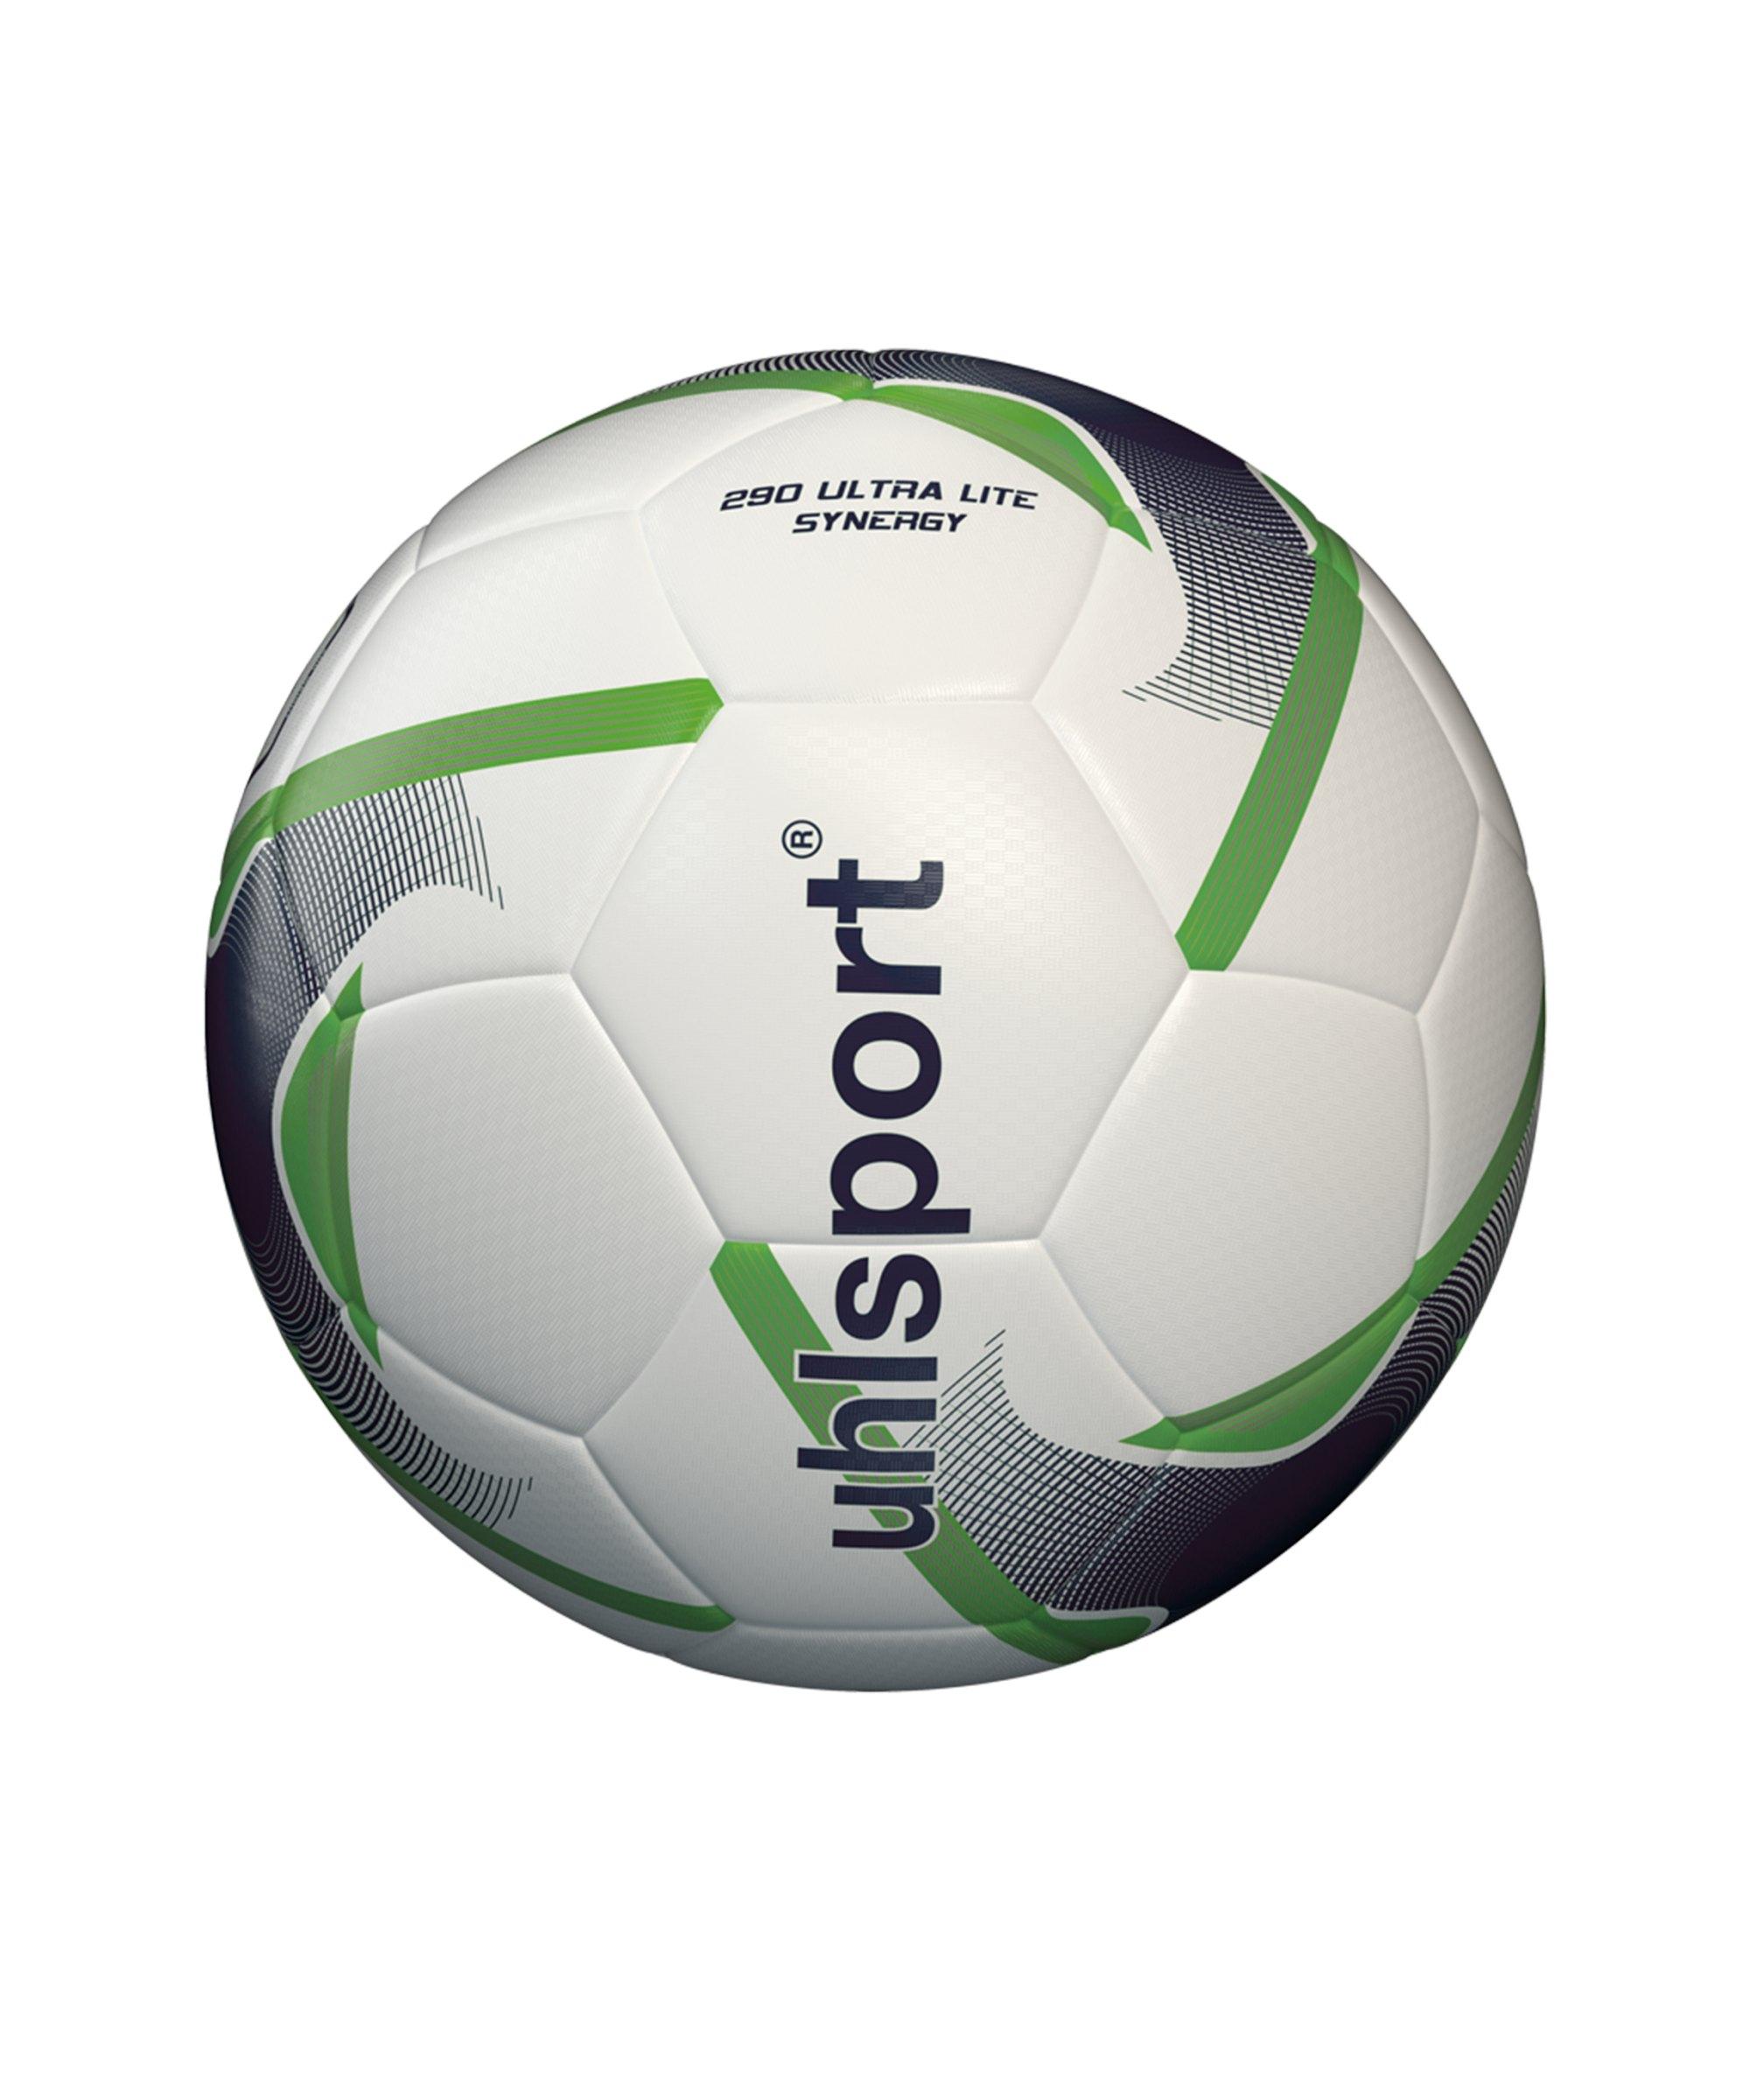 Uhlsport 290 Ultra Lite Synergy Lightball F01 - weiss